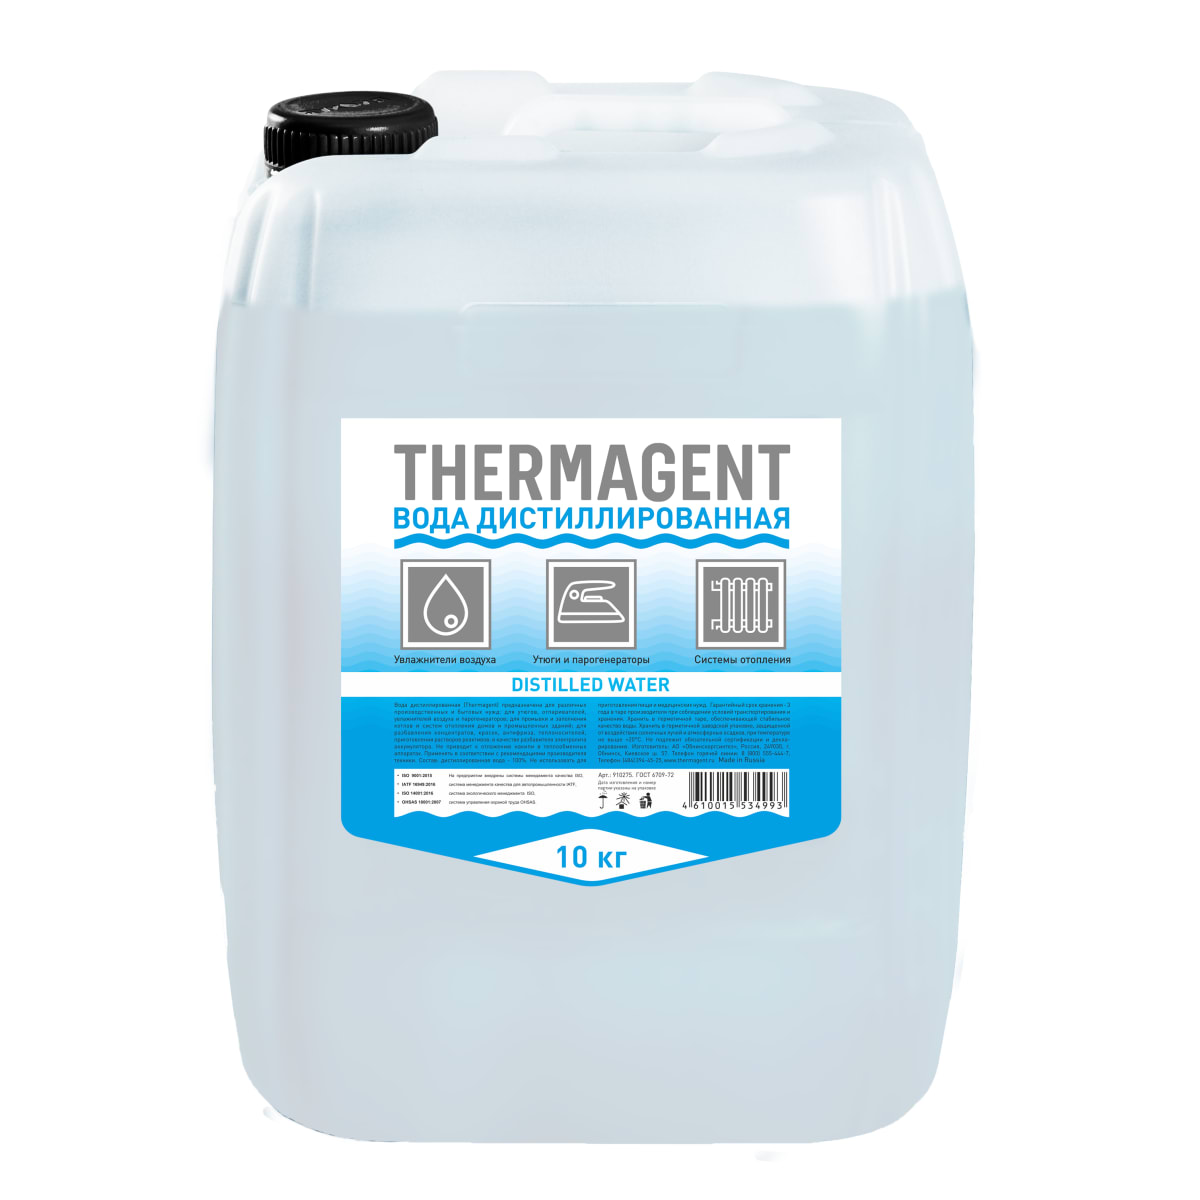 Вода дистиллированная Thermagent, 10 л